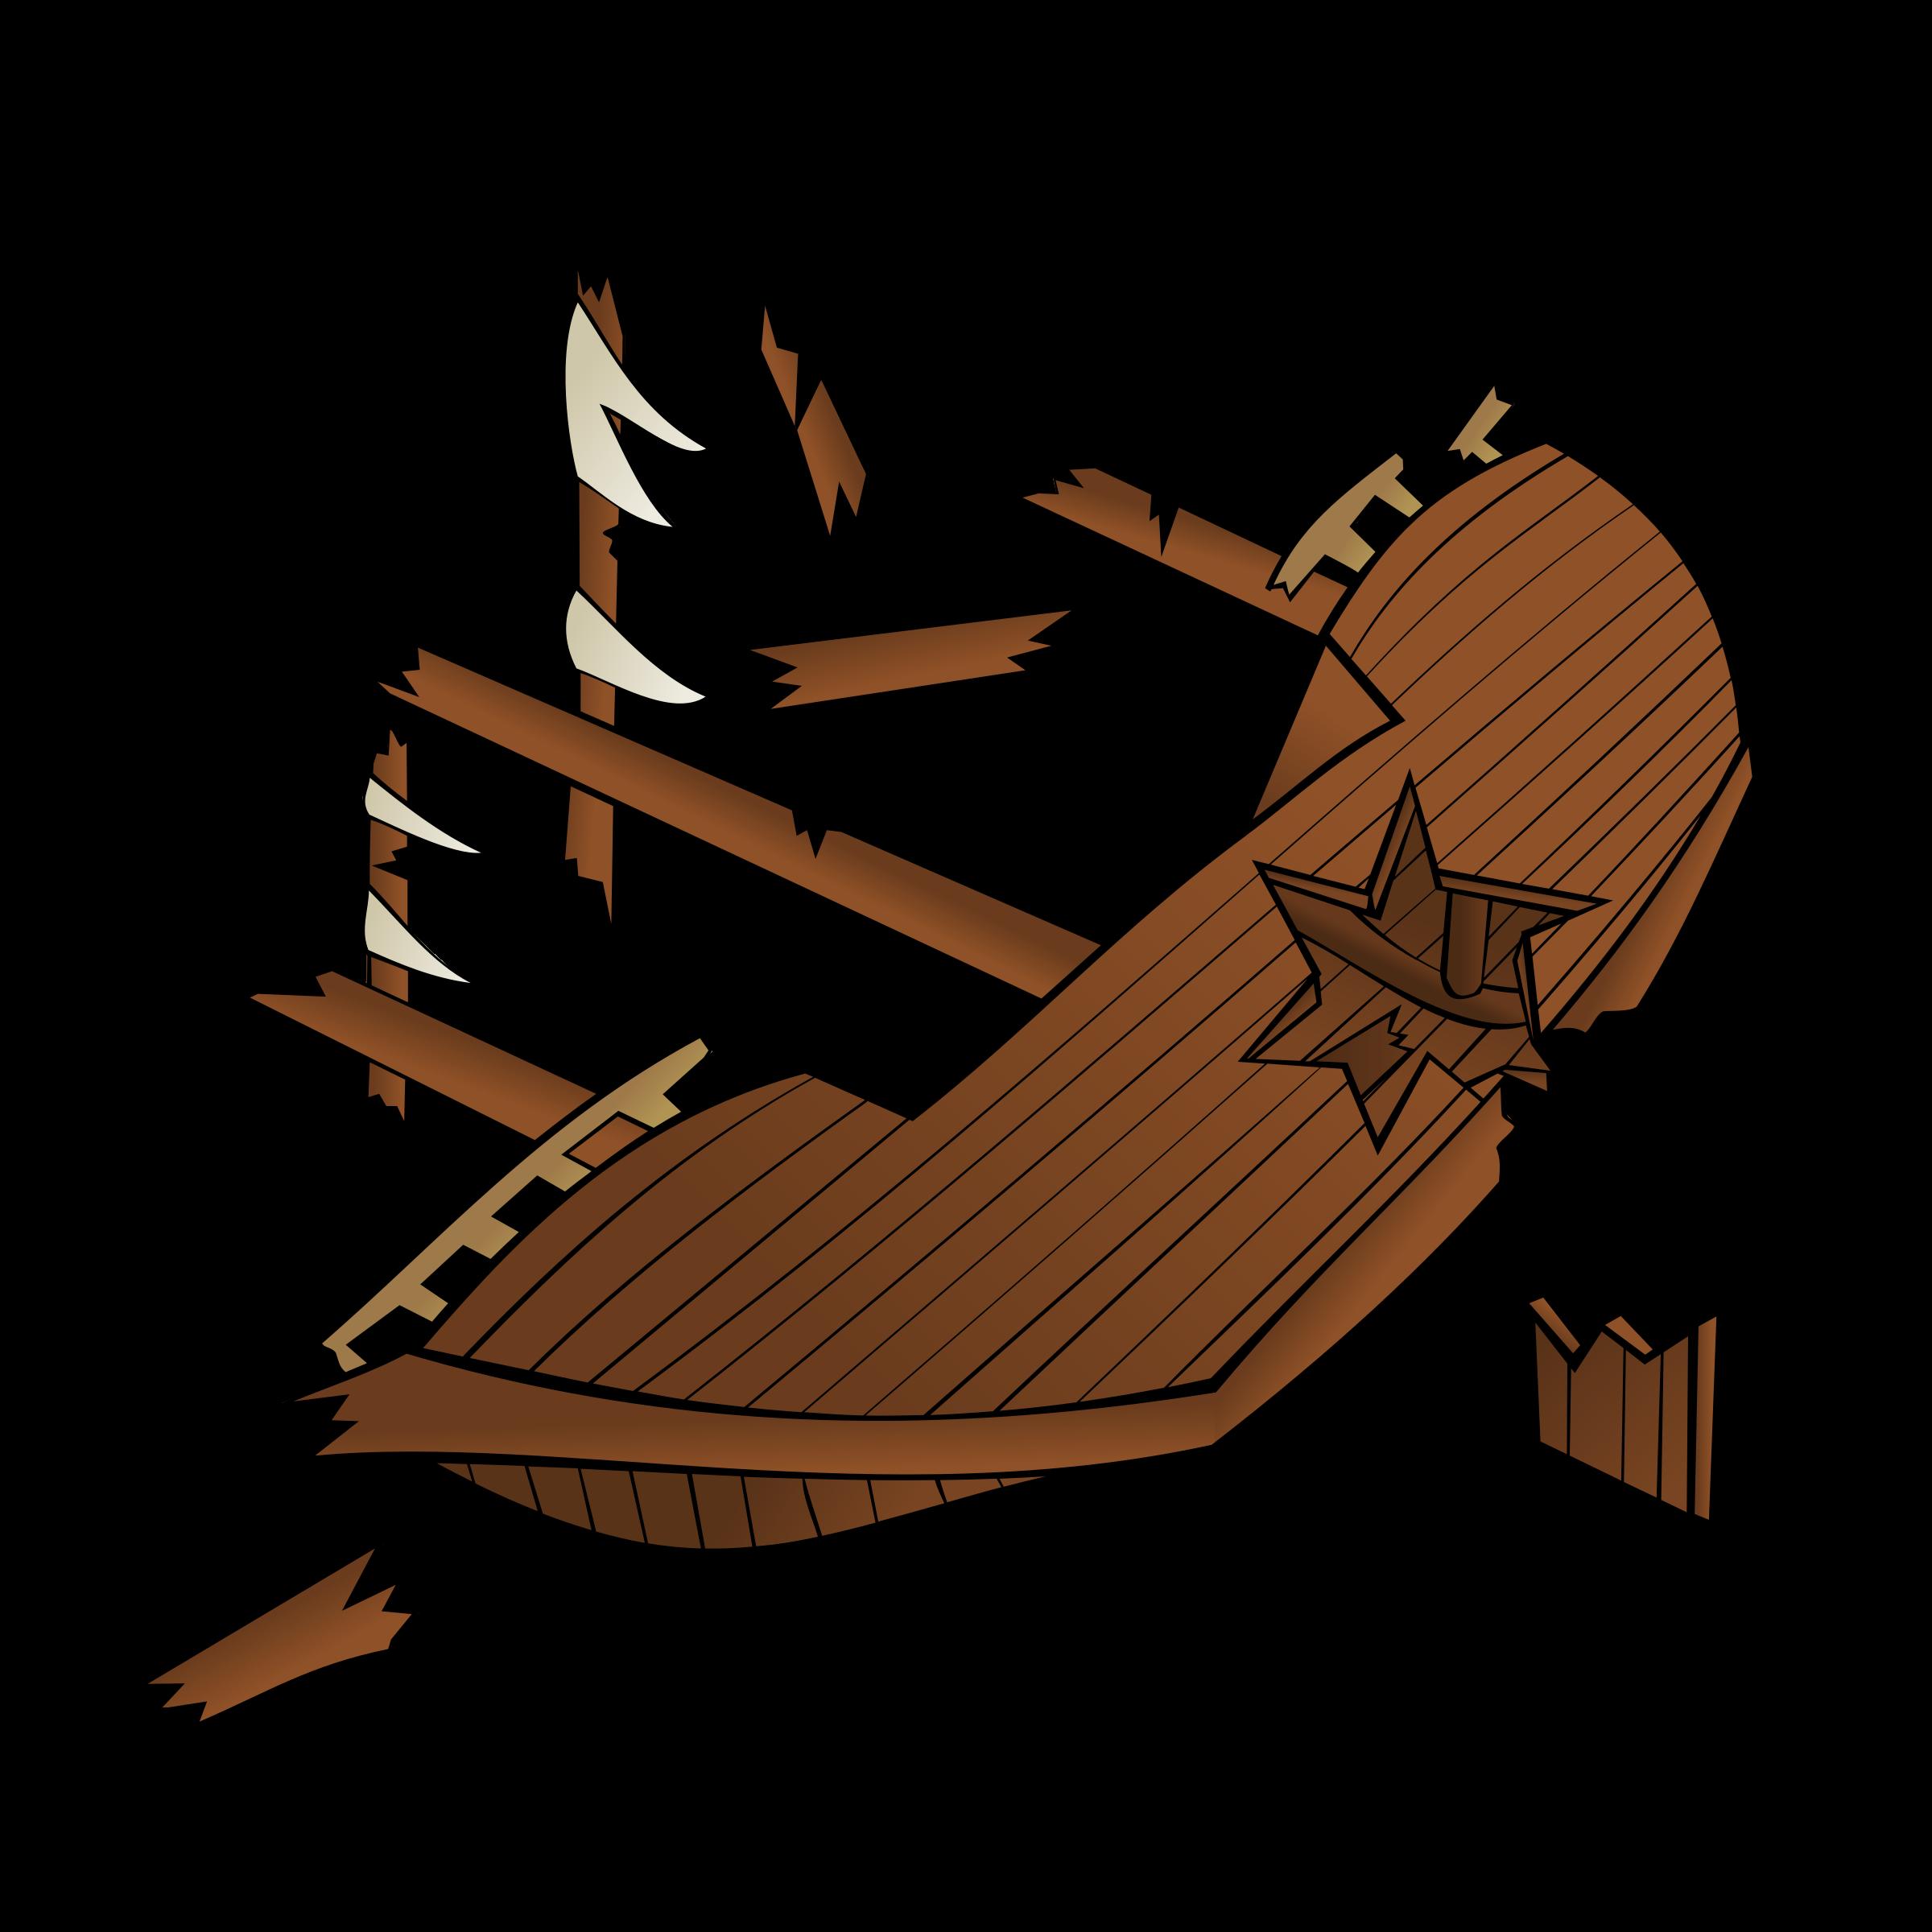 Wreck clipart wrecked ship Map RPG Shipwreck Clipart Shipwreck